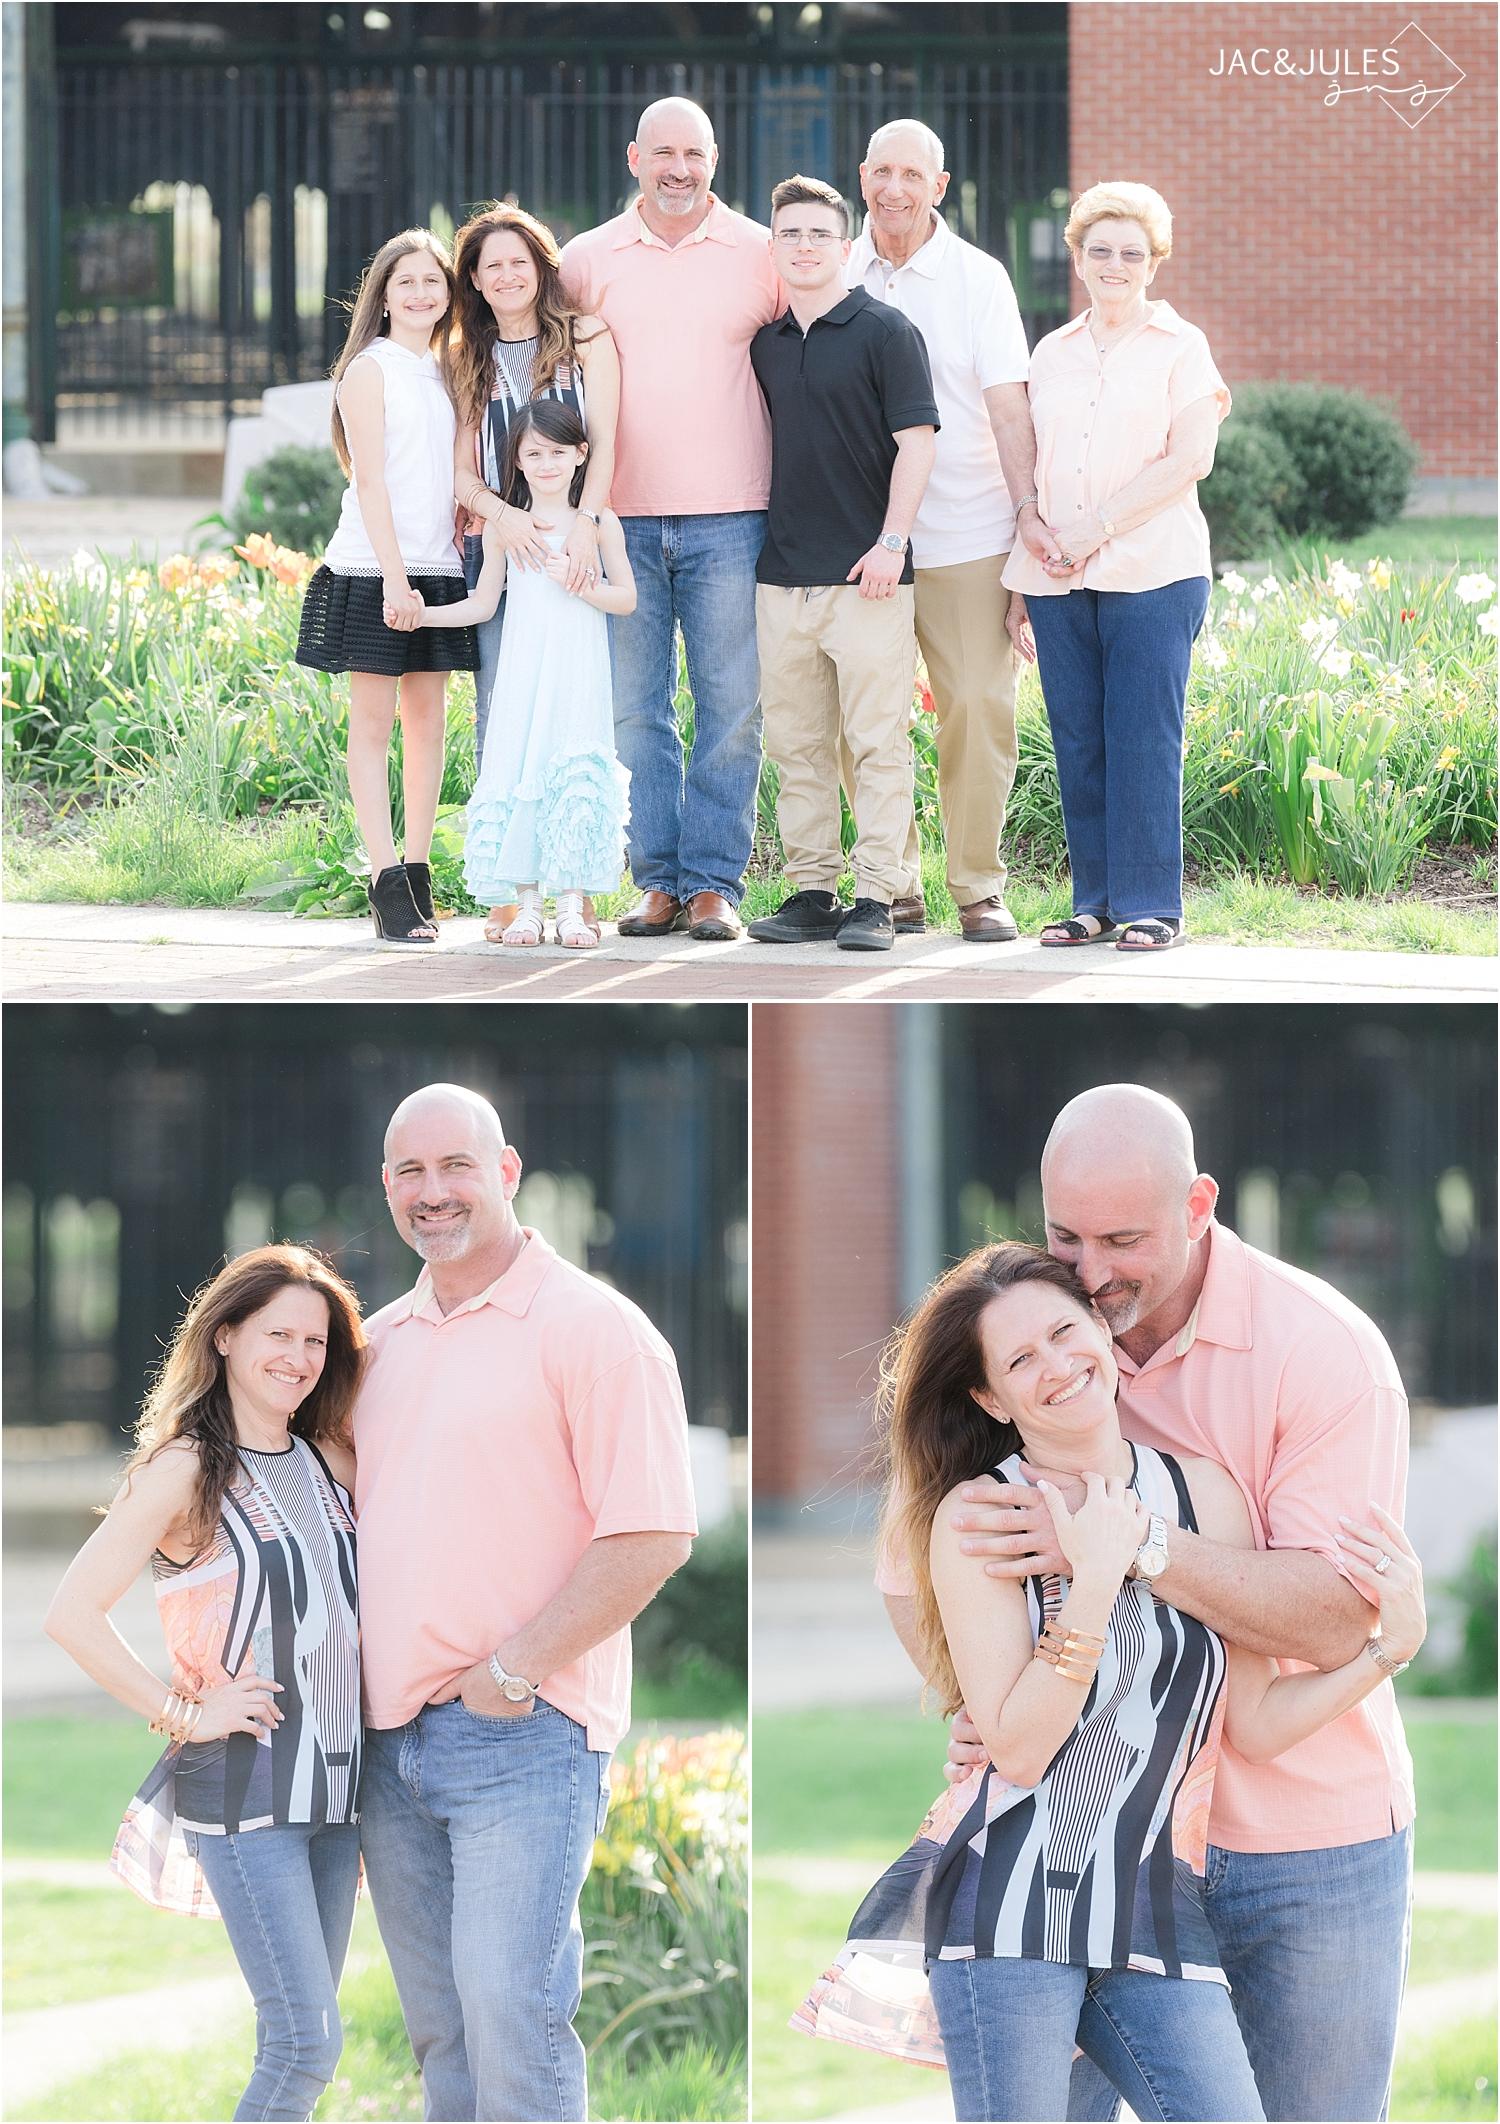 family photos at liberty state park